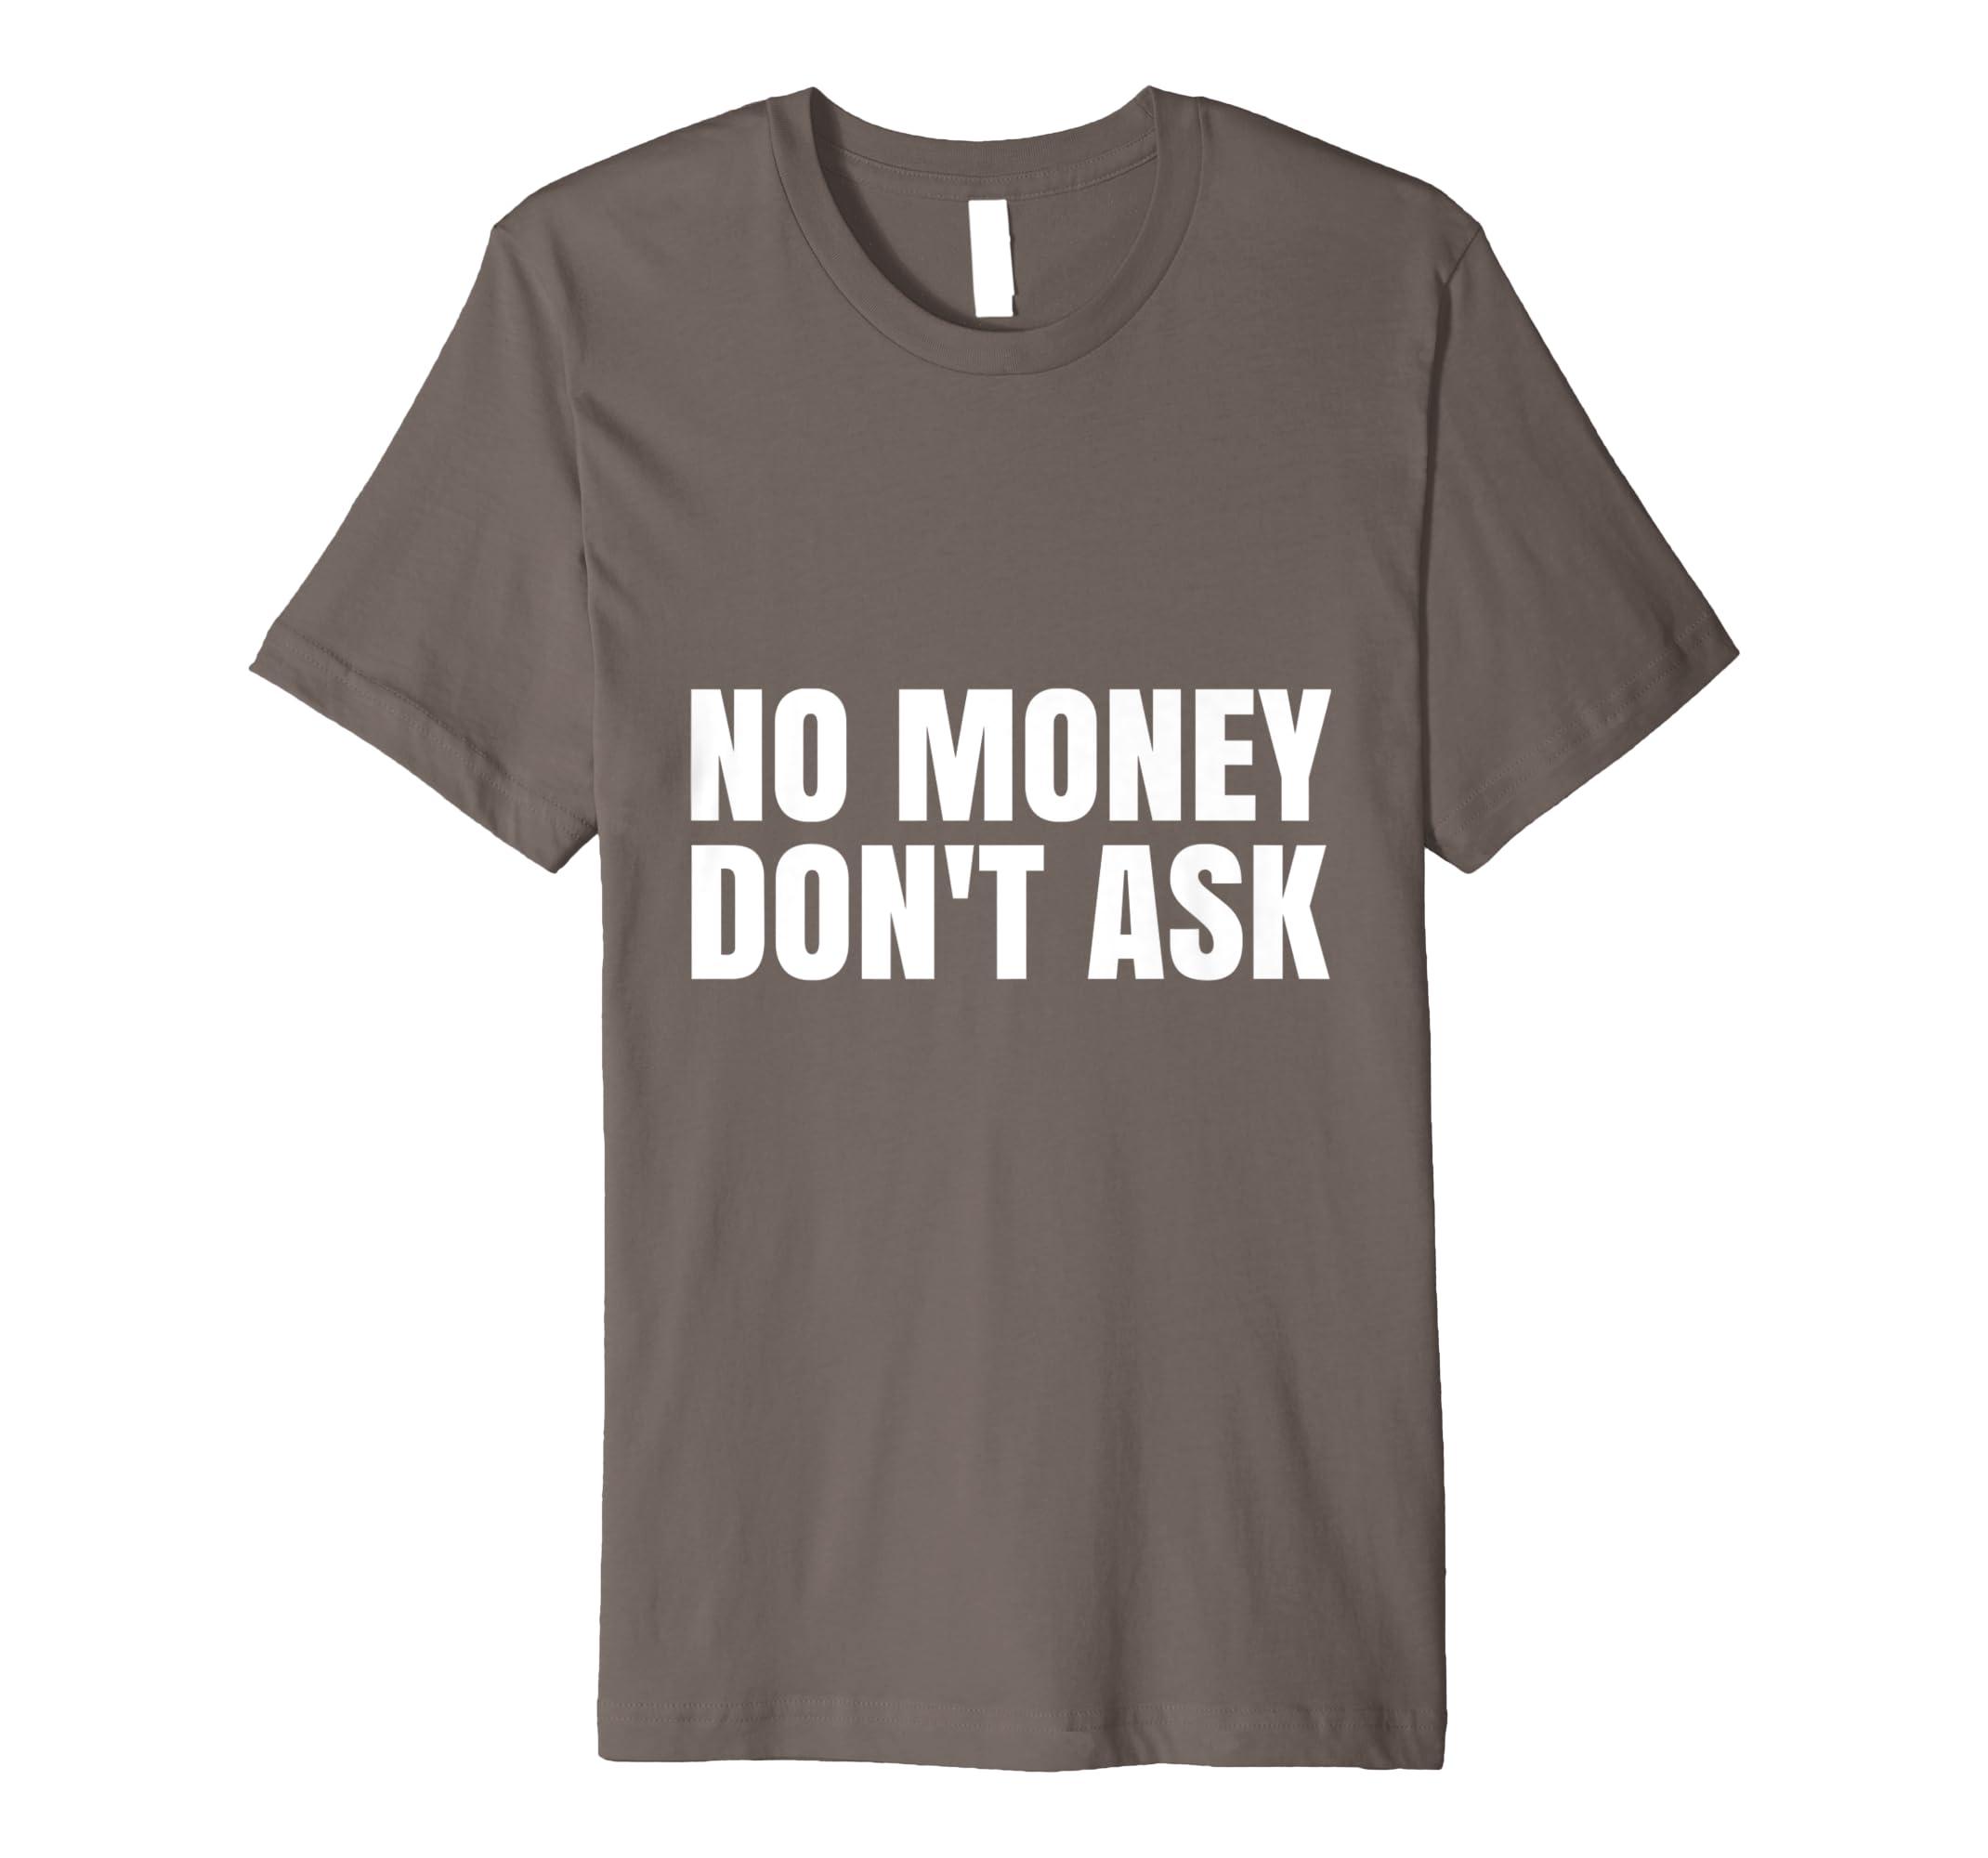 eeefa1ab Amazon.com: No Money Funny Shirt / Bank of Dad ATM / Broke student Shirt:  Clothing